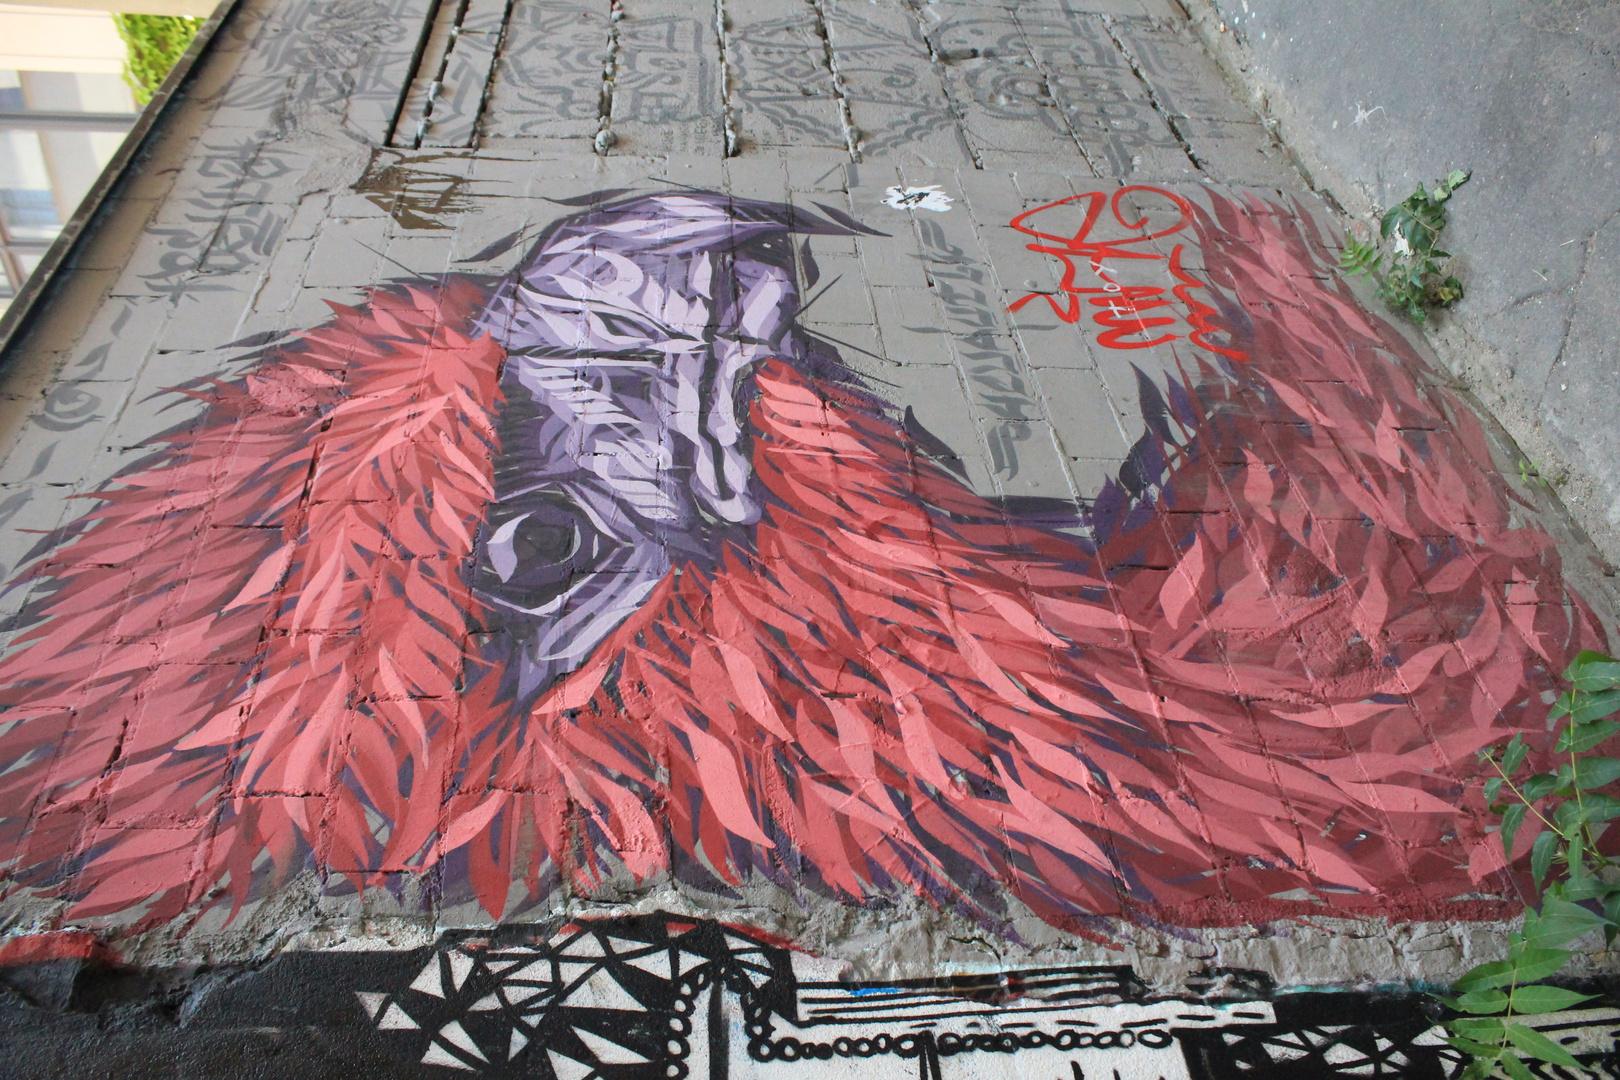 Graffiti Hackesche Höfe Berlin